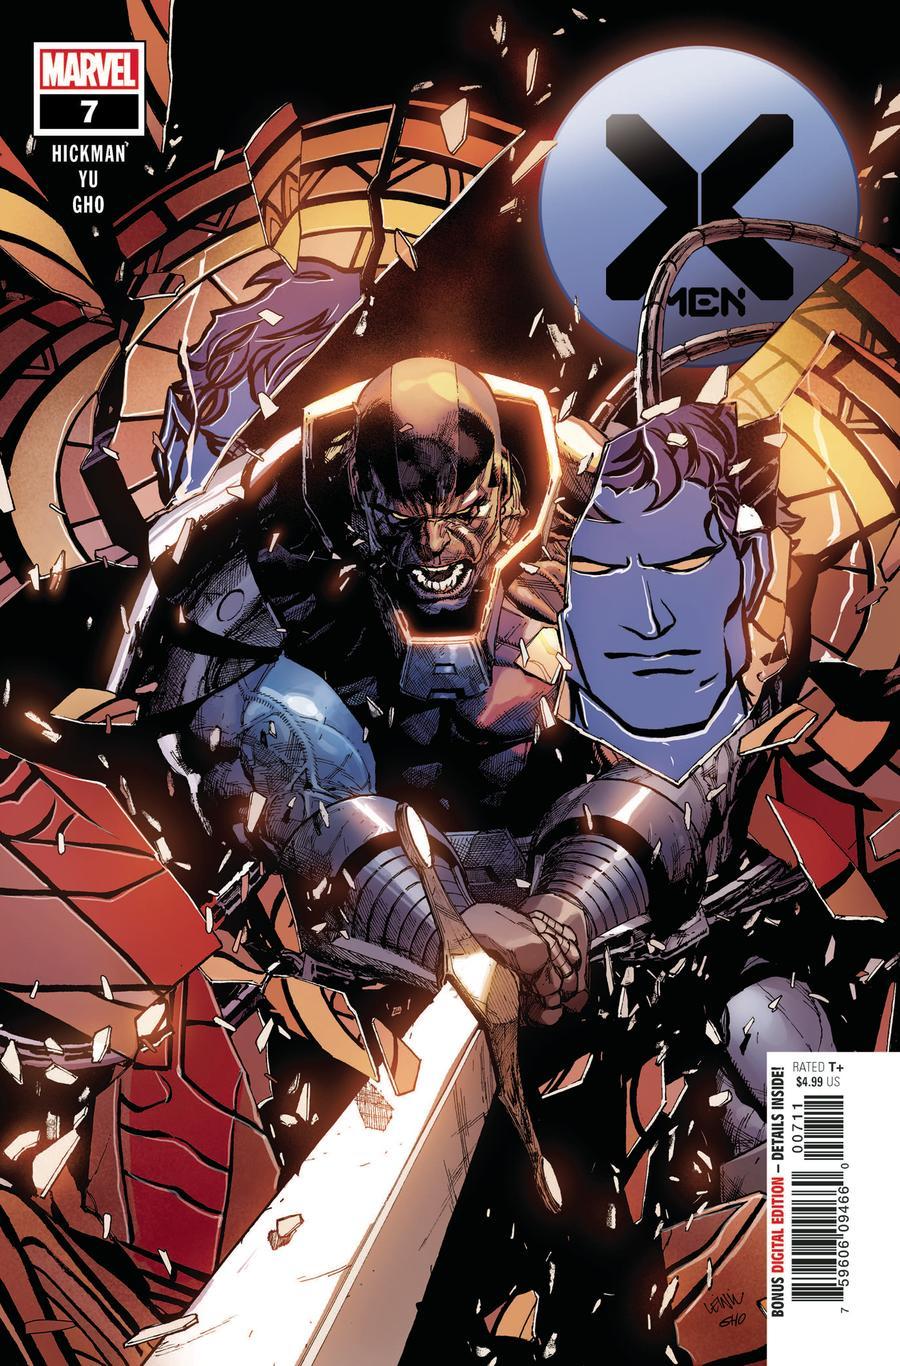 X-Men Vol 5 #7 Cover A Regular Leinil Francis Yu Cover (Dawn Of X Tie-In)